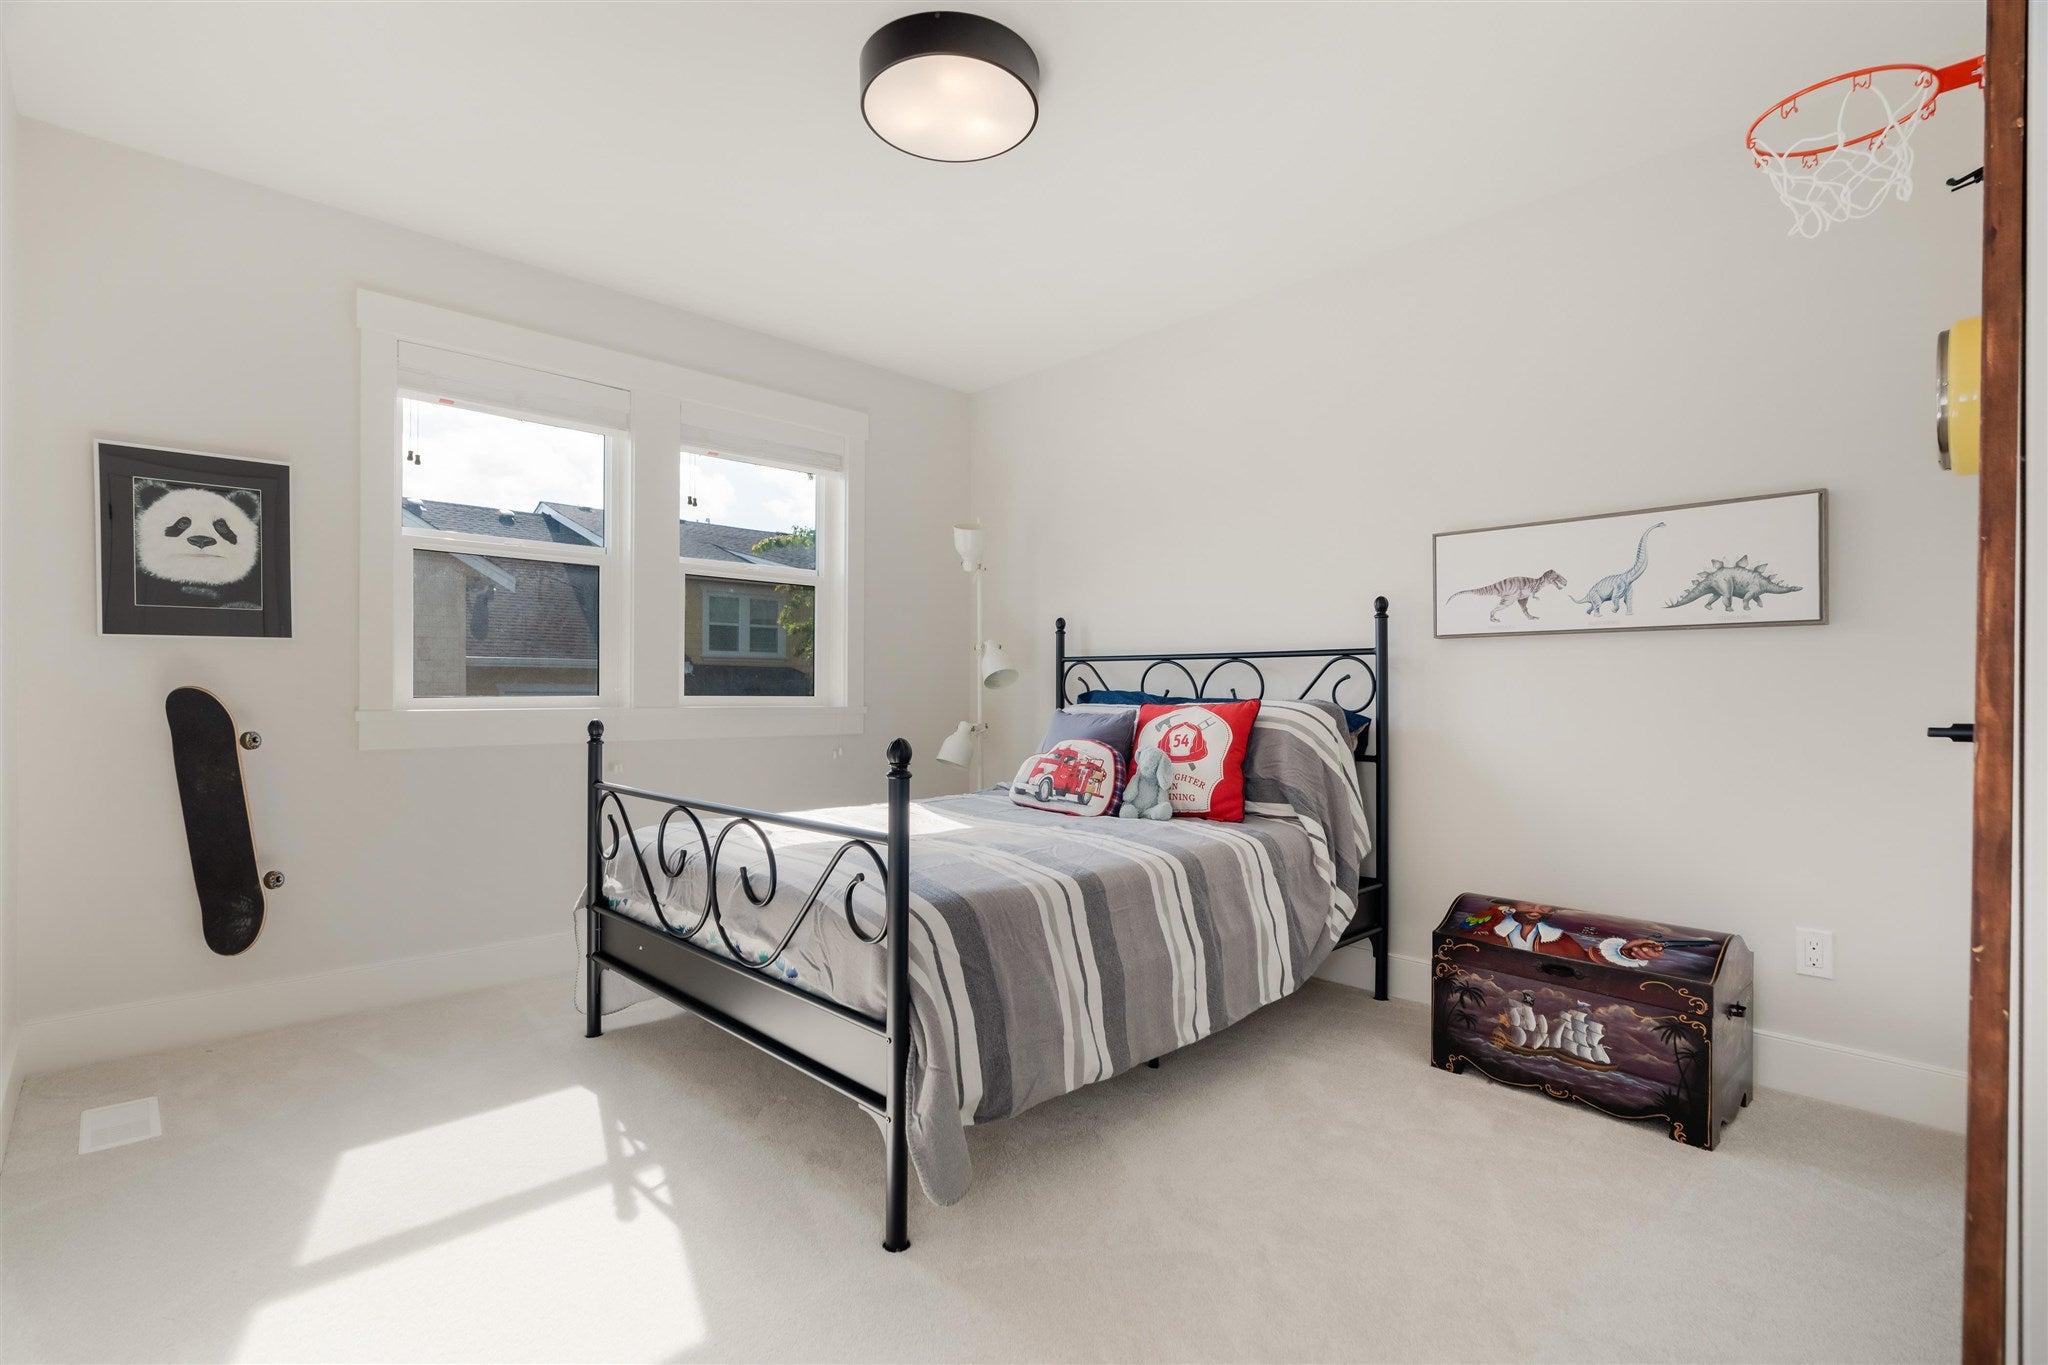 40 21858 47B AVENUE - Murrayville Townhouse for sale, 4 Bedrooms (R2603956) - #22